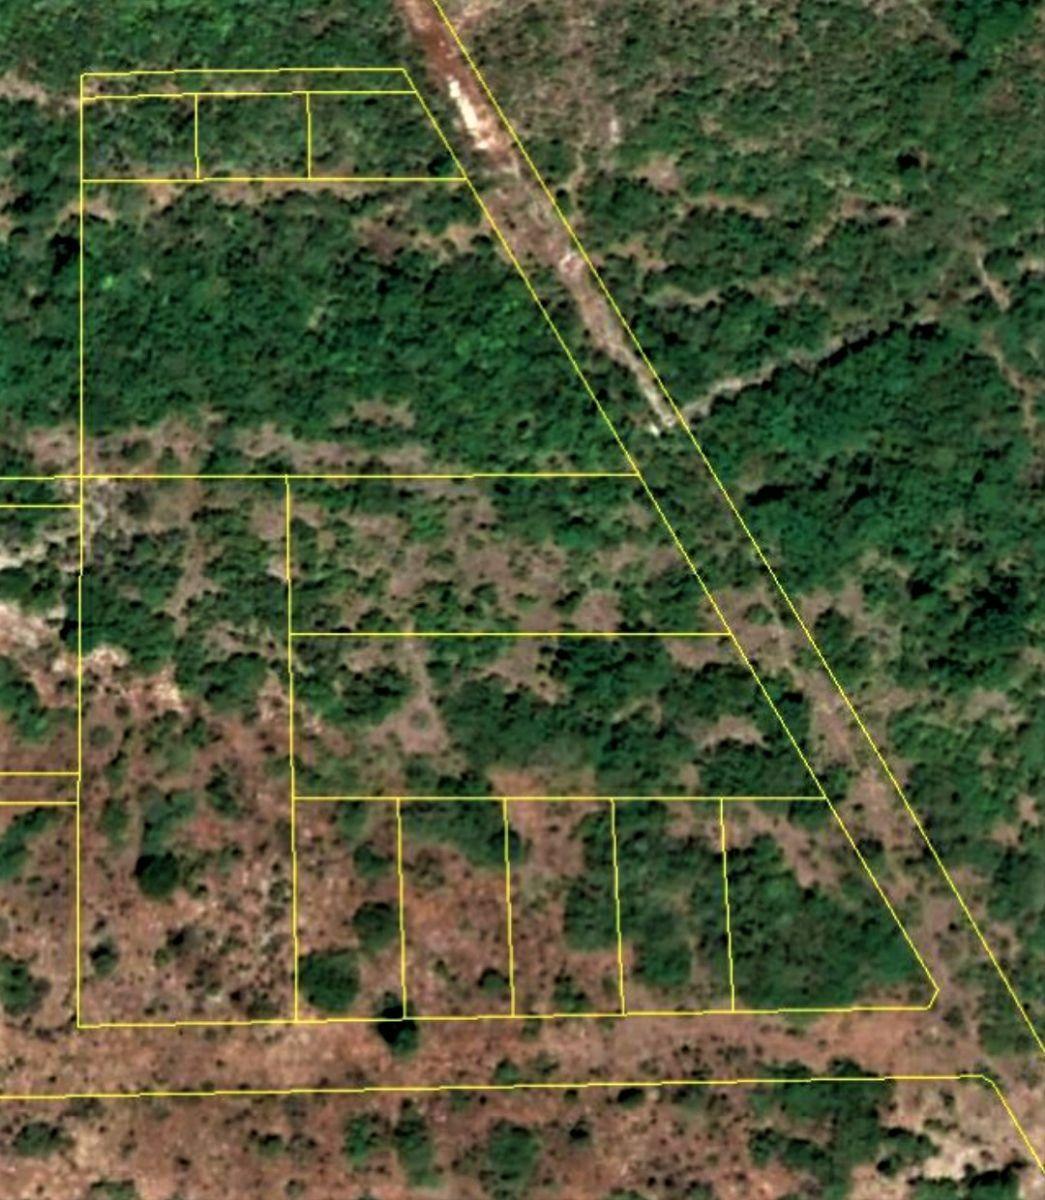 4 de 4: Foto satelital del lote E4 y subdivisiones.